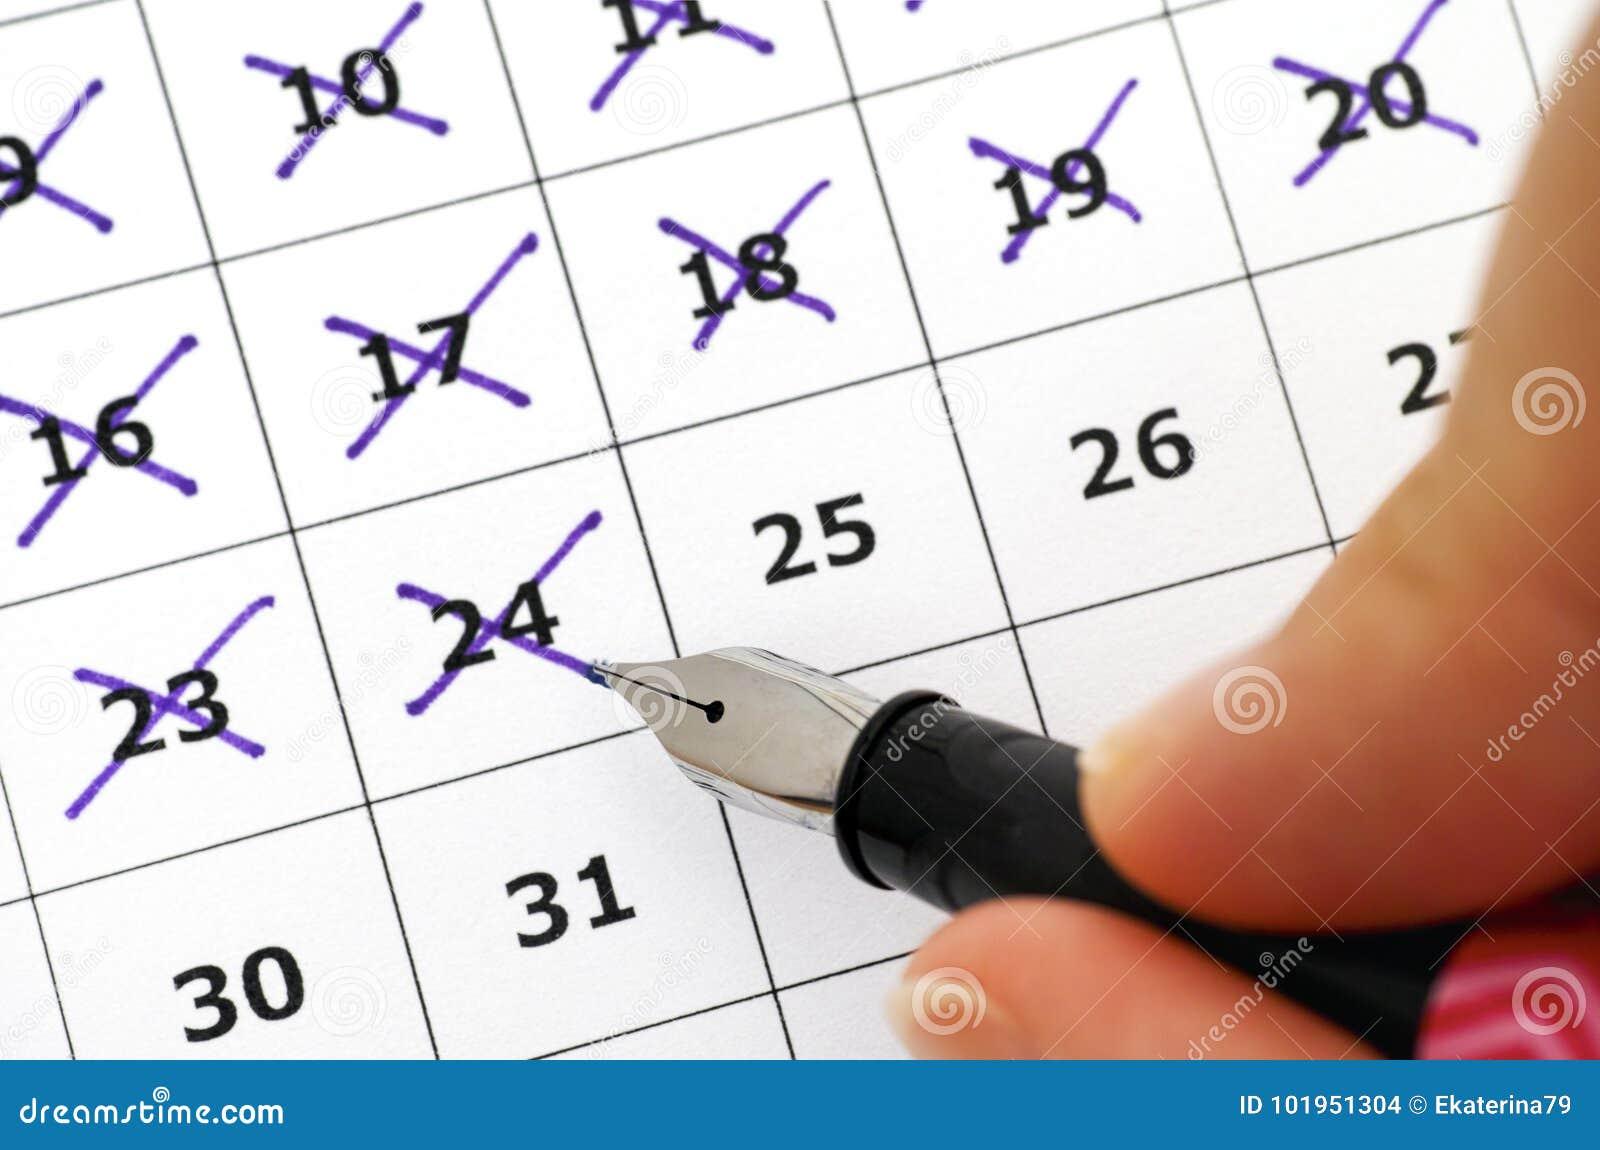 Fountain Pen In Woman Hand Marking Days Calendar Stock Photo Parts Diagram